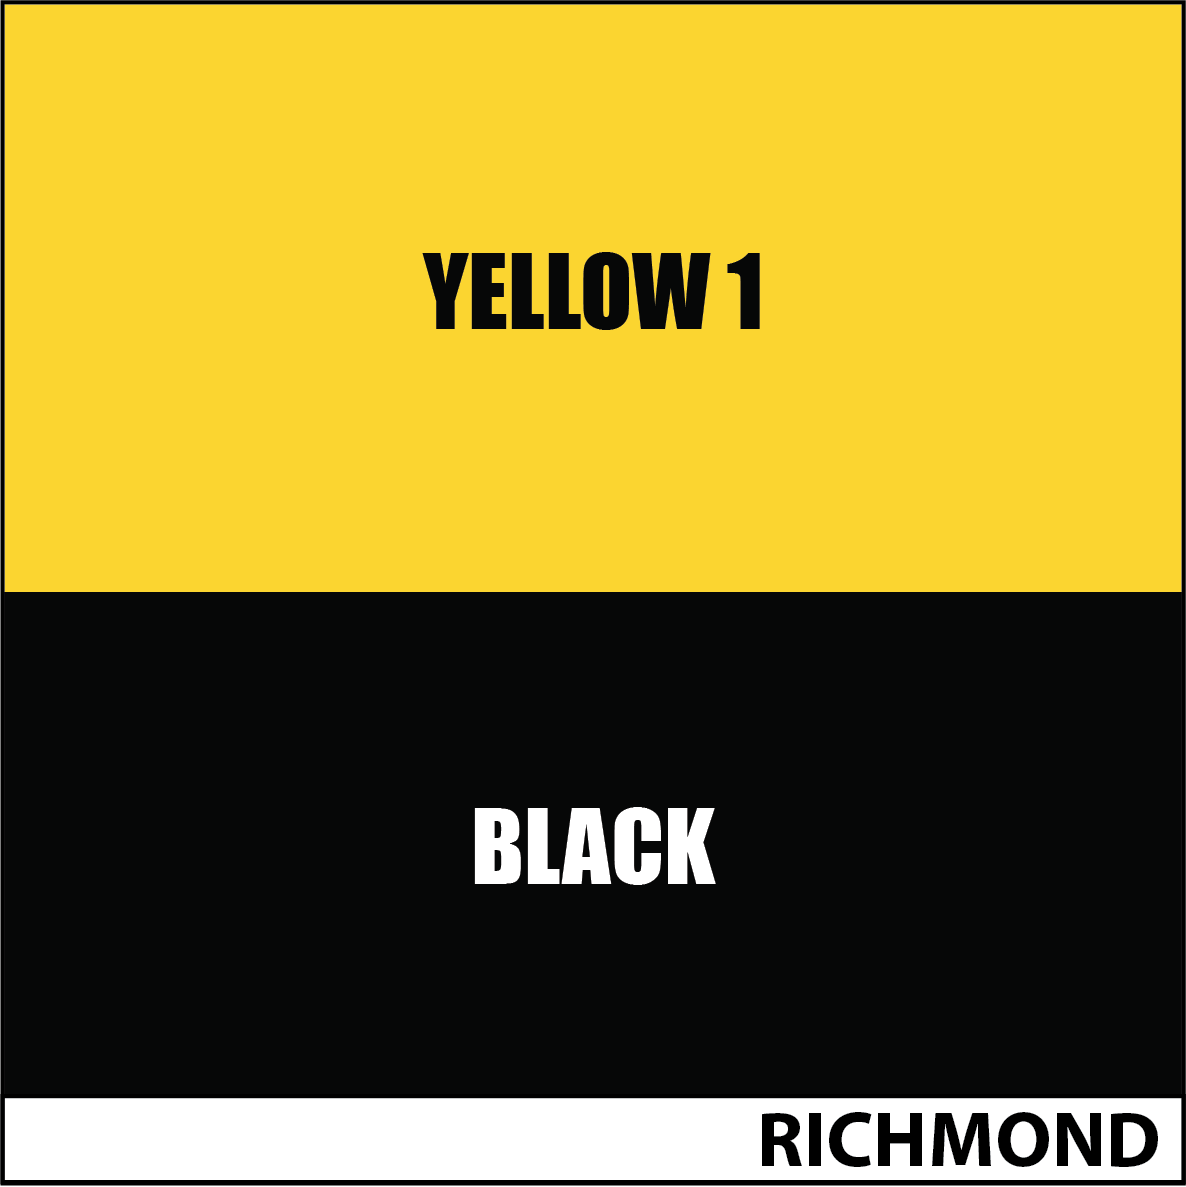 12ML_SuberbColours_Richmond.png